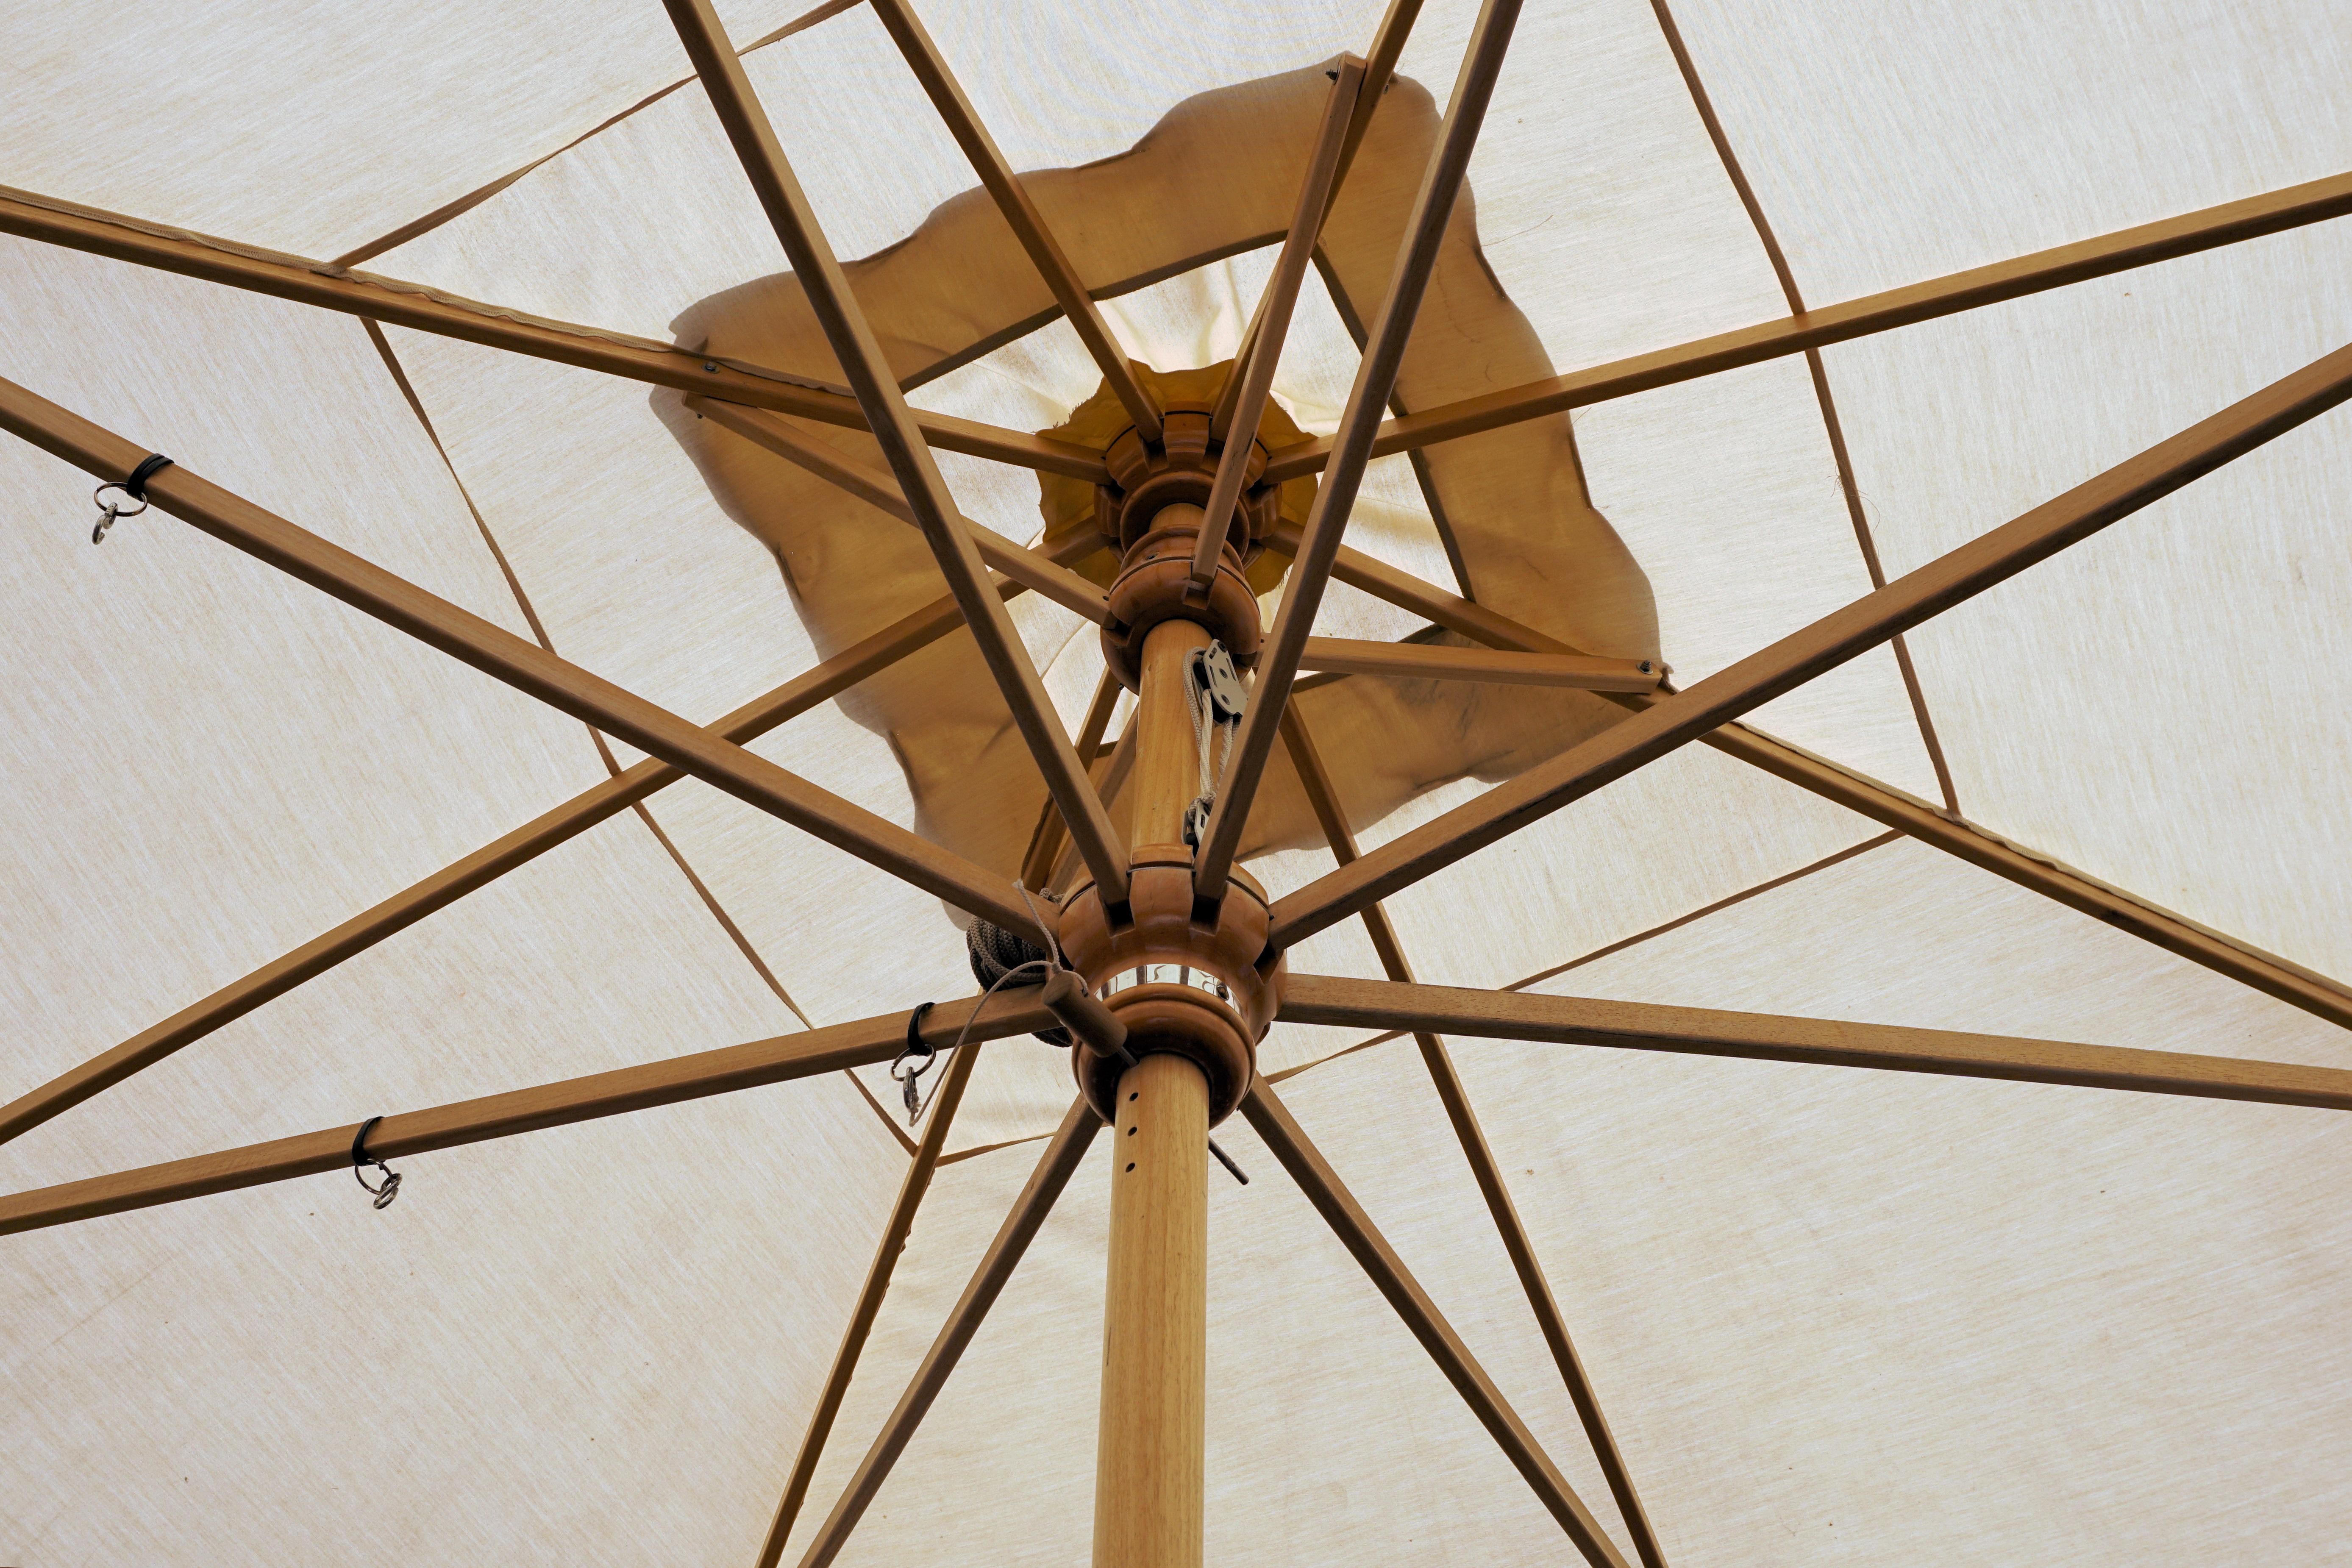 Fotos gratis : pantalla, madera, sol, línea, mástil, paraguas, marco ...